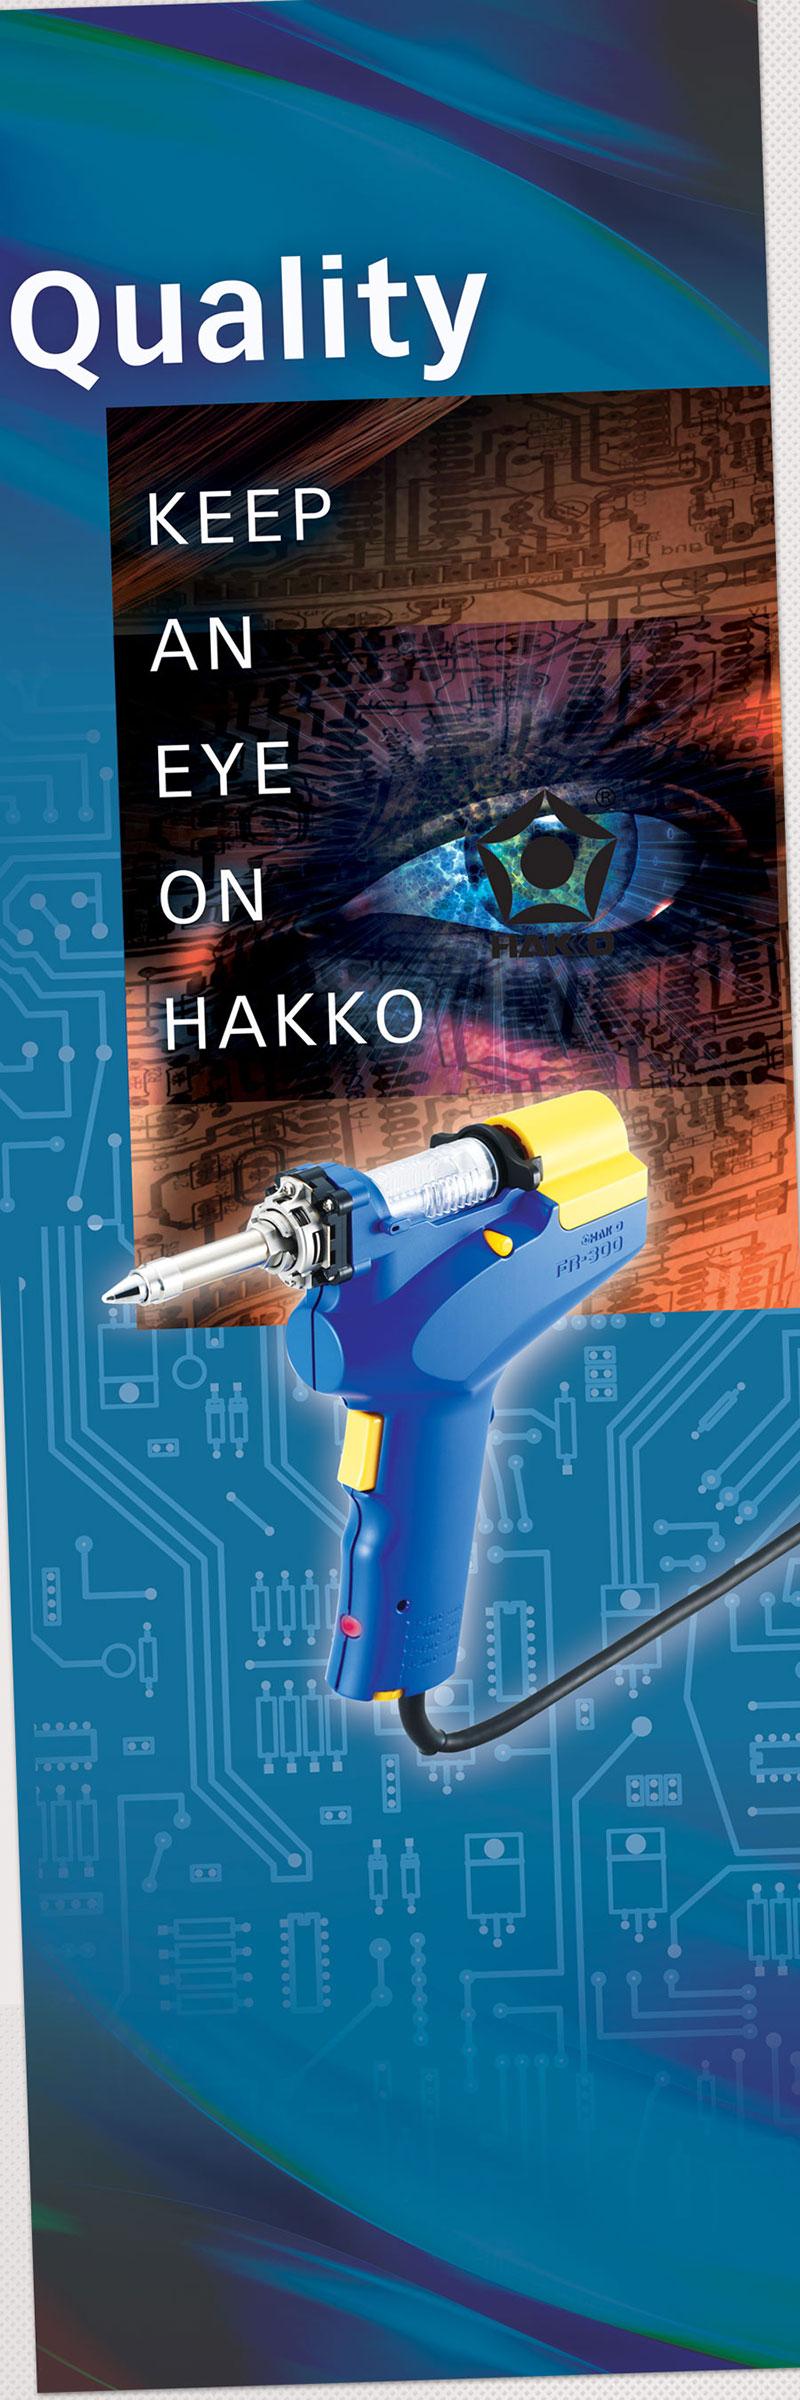 Hakko-TS-vertblue.jpg